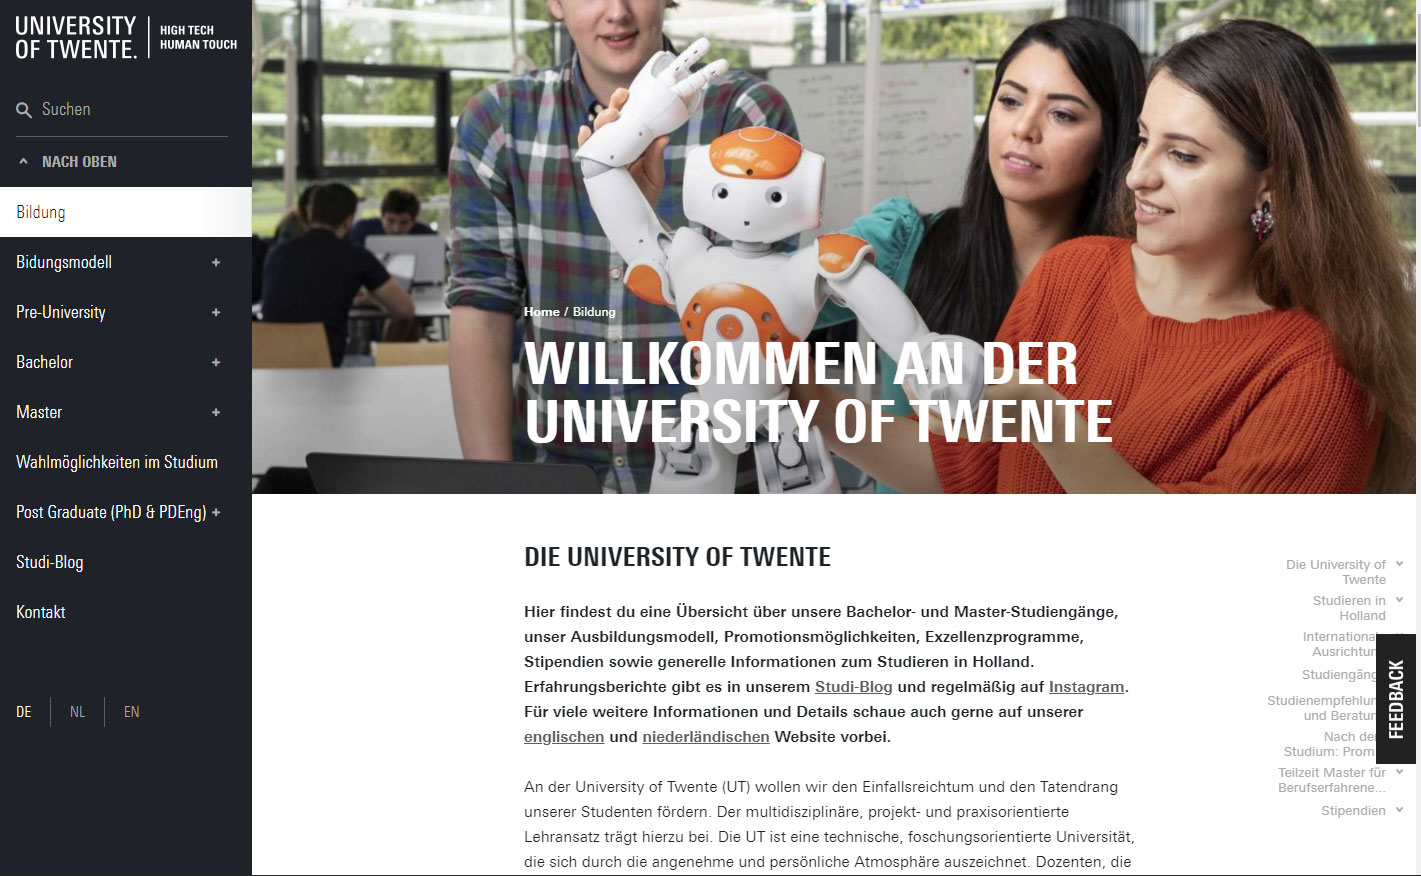 18 Universität Twente